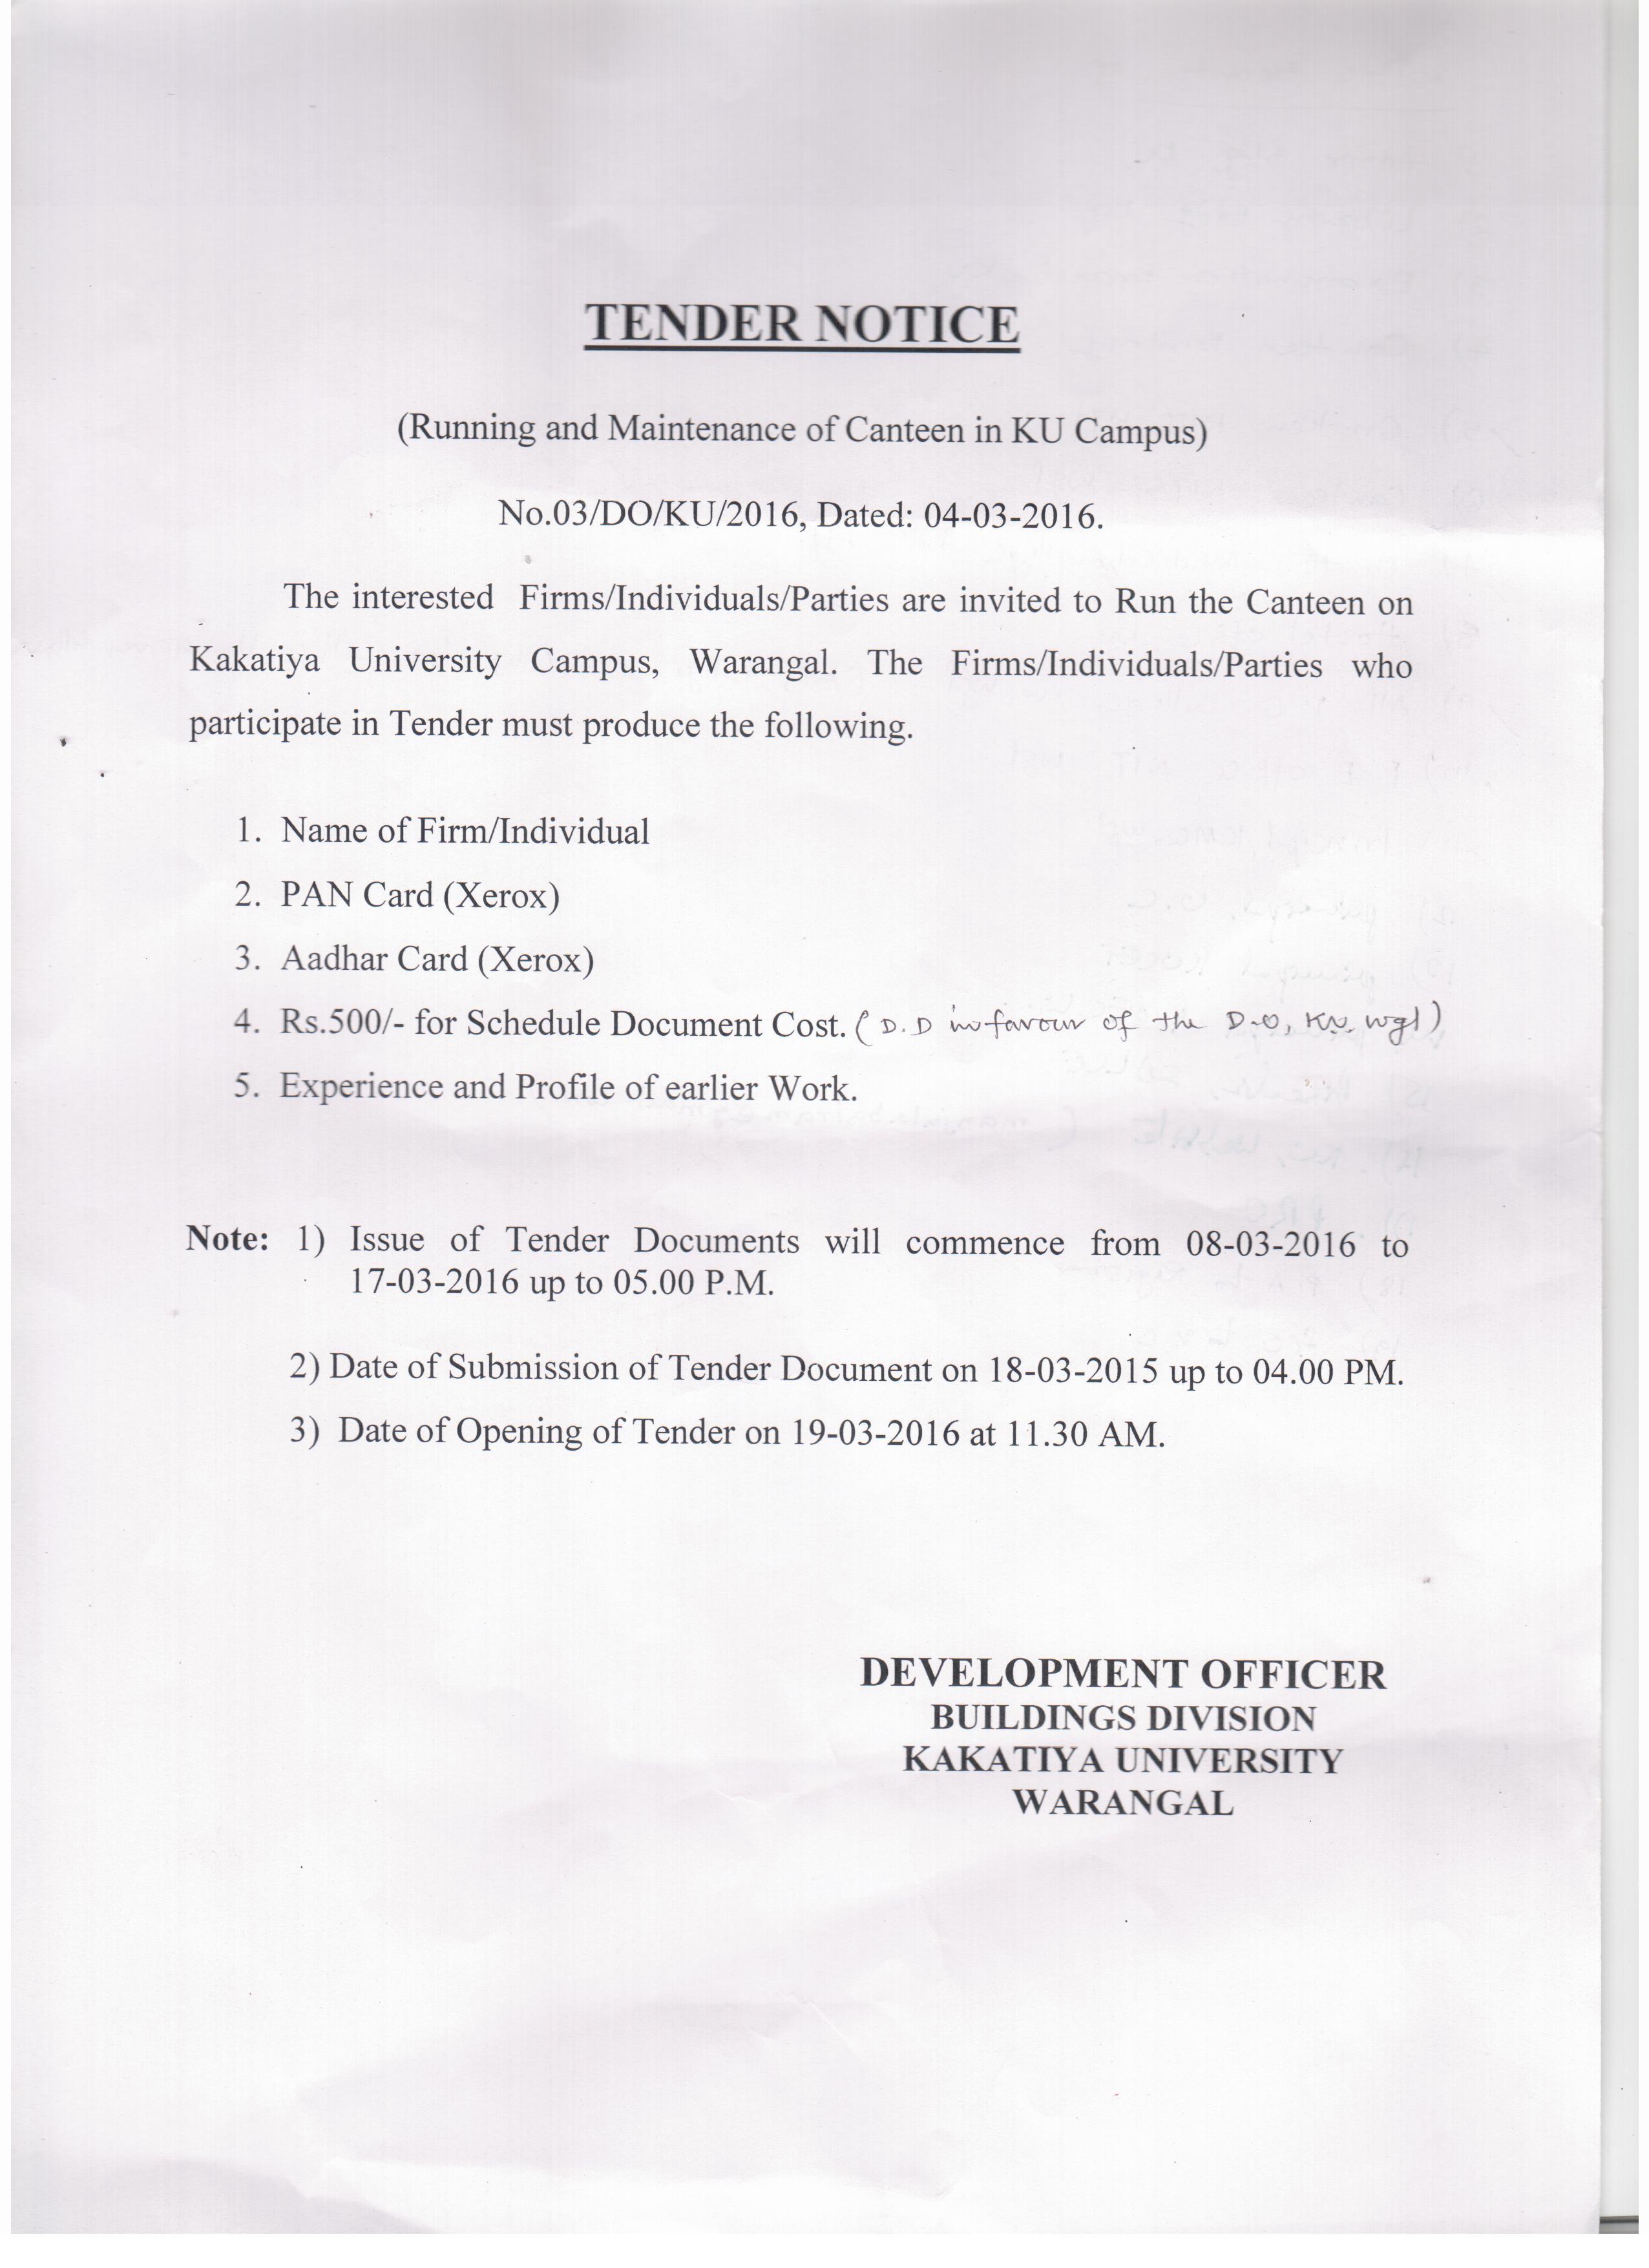 Kakatiya University, Warangal-506009, Telangana, India